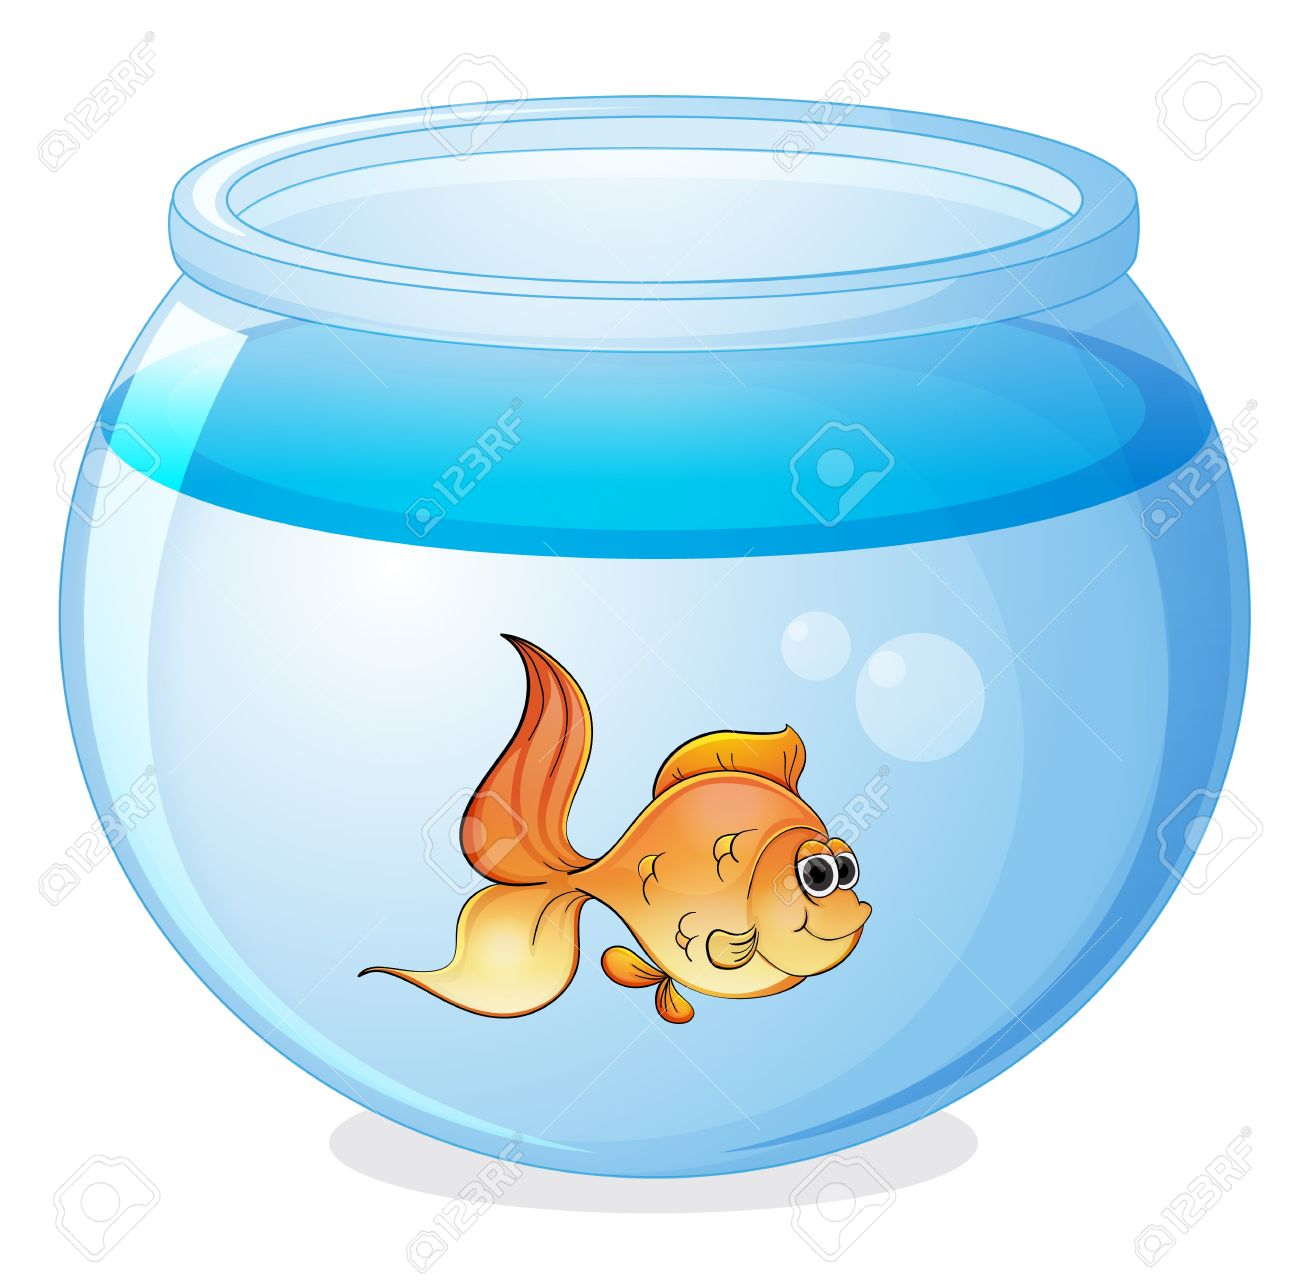 922 Gold Fish Bowl Cliparts, Stock Vector And Royalty Free Gold.